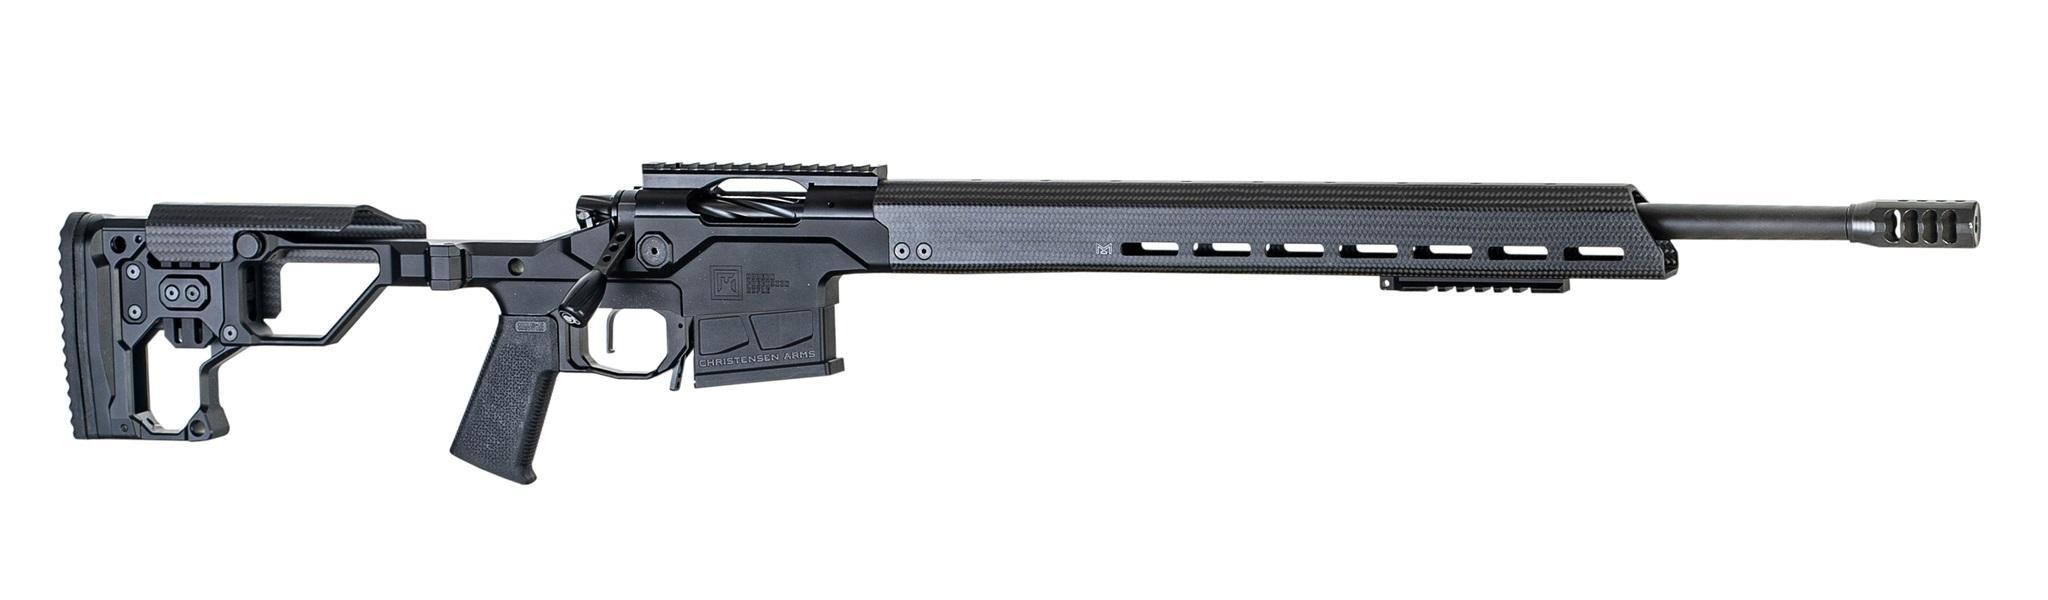 MPR STEEL 6MMCR BLACK 24 - 801-03035-00